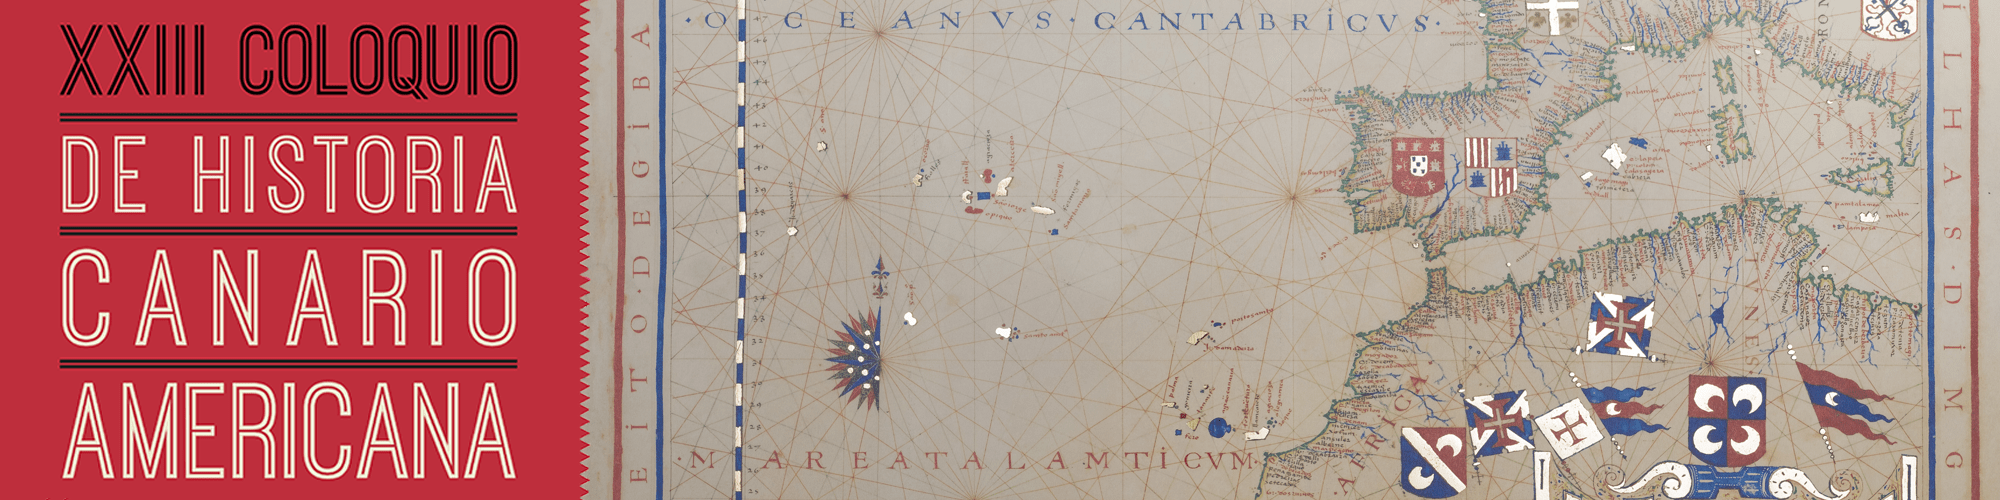 XXIII Coloquio de Historia Canario Americana